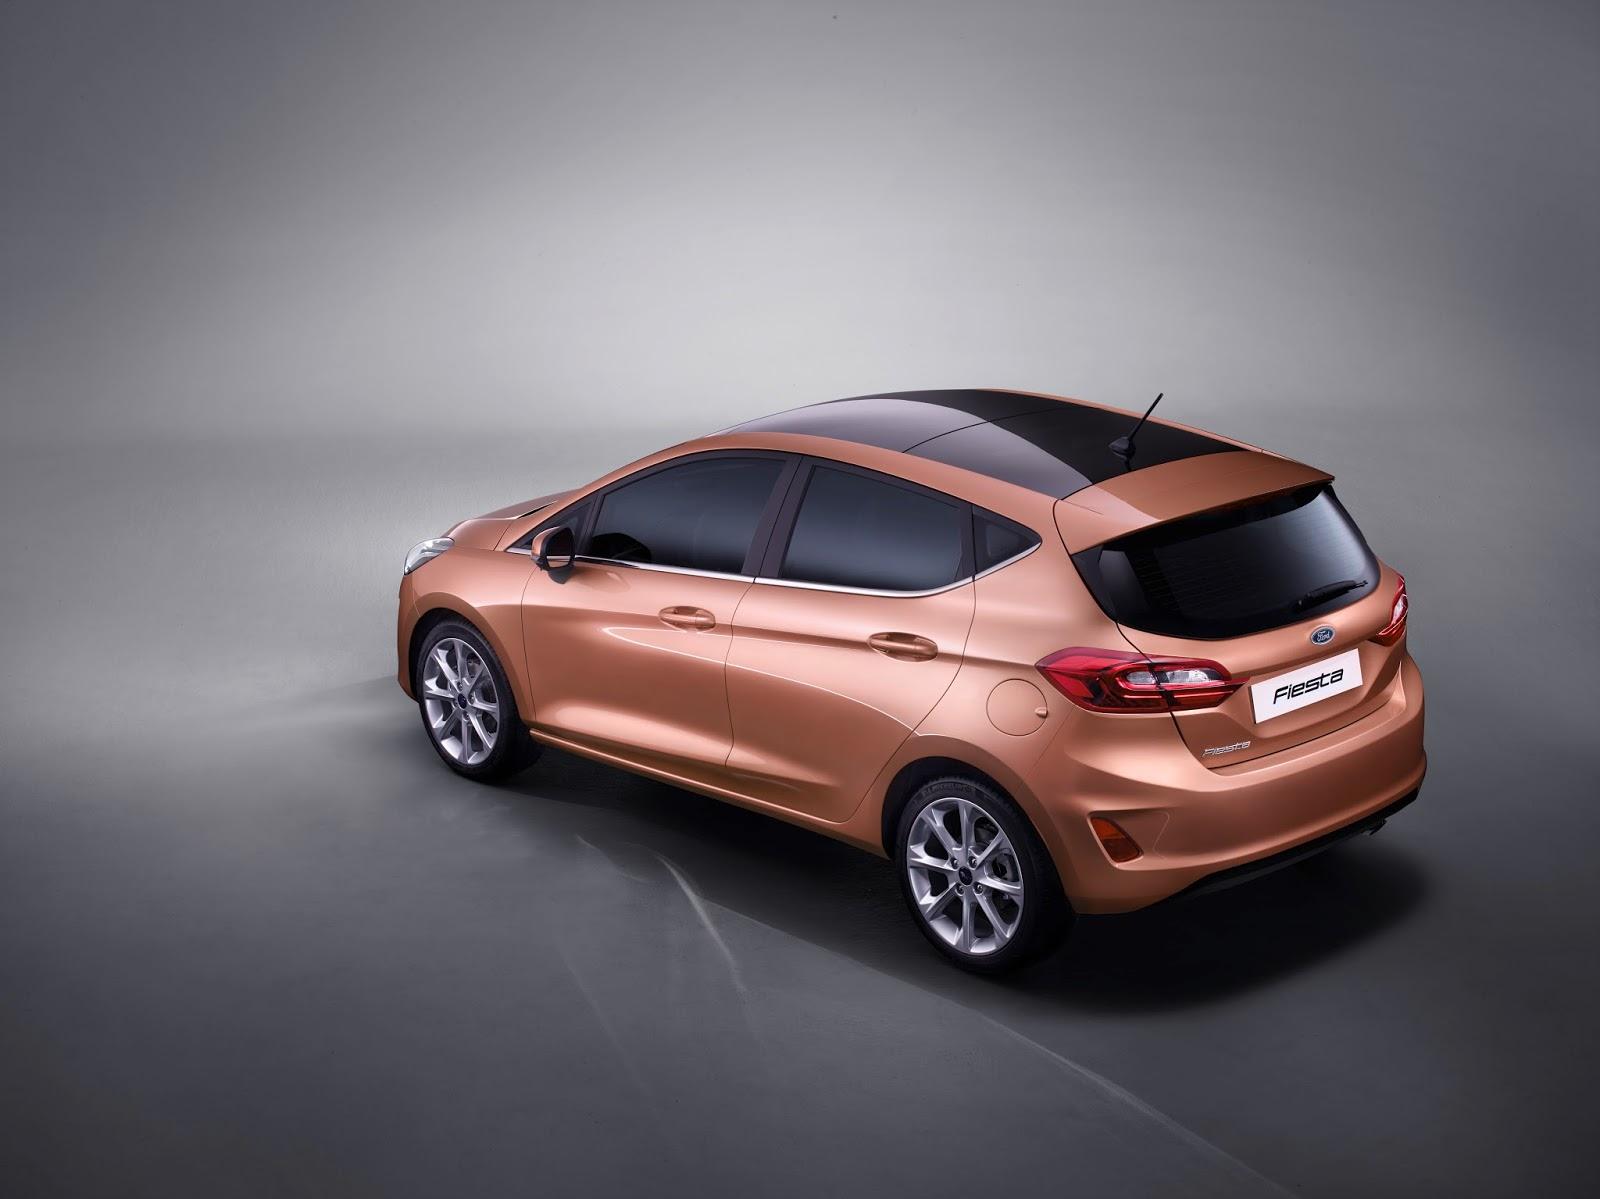 FORD FIESTA2016 TITANIUM 34 REAR 02 Τα πρώτα Ford Fiesta έρχονται στην Ελλάδα, με τιμή από 12.990€ Bestseller, Ford, Ford Fiesta, supermini, Λανσάρισμα